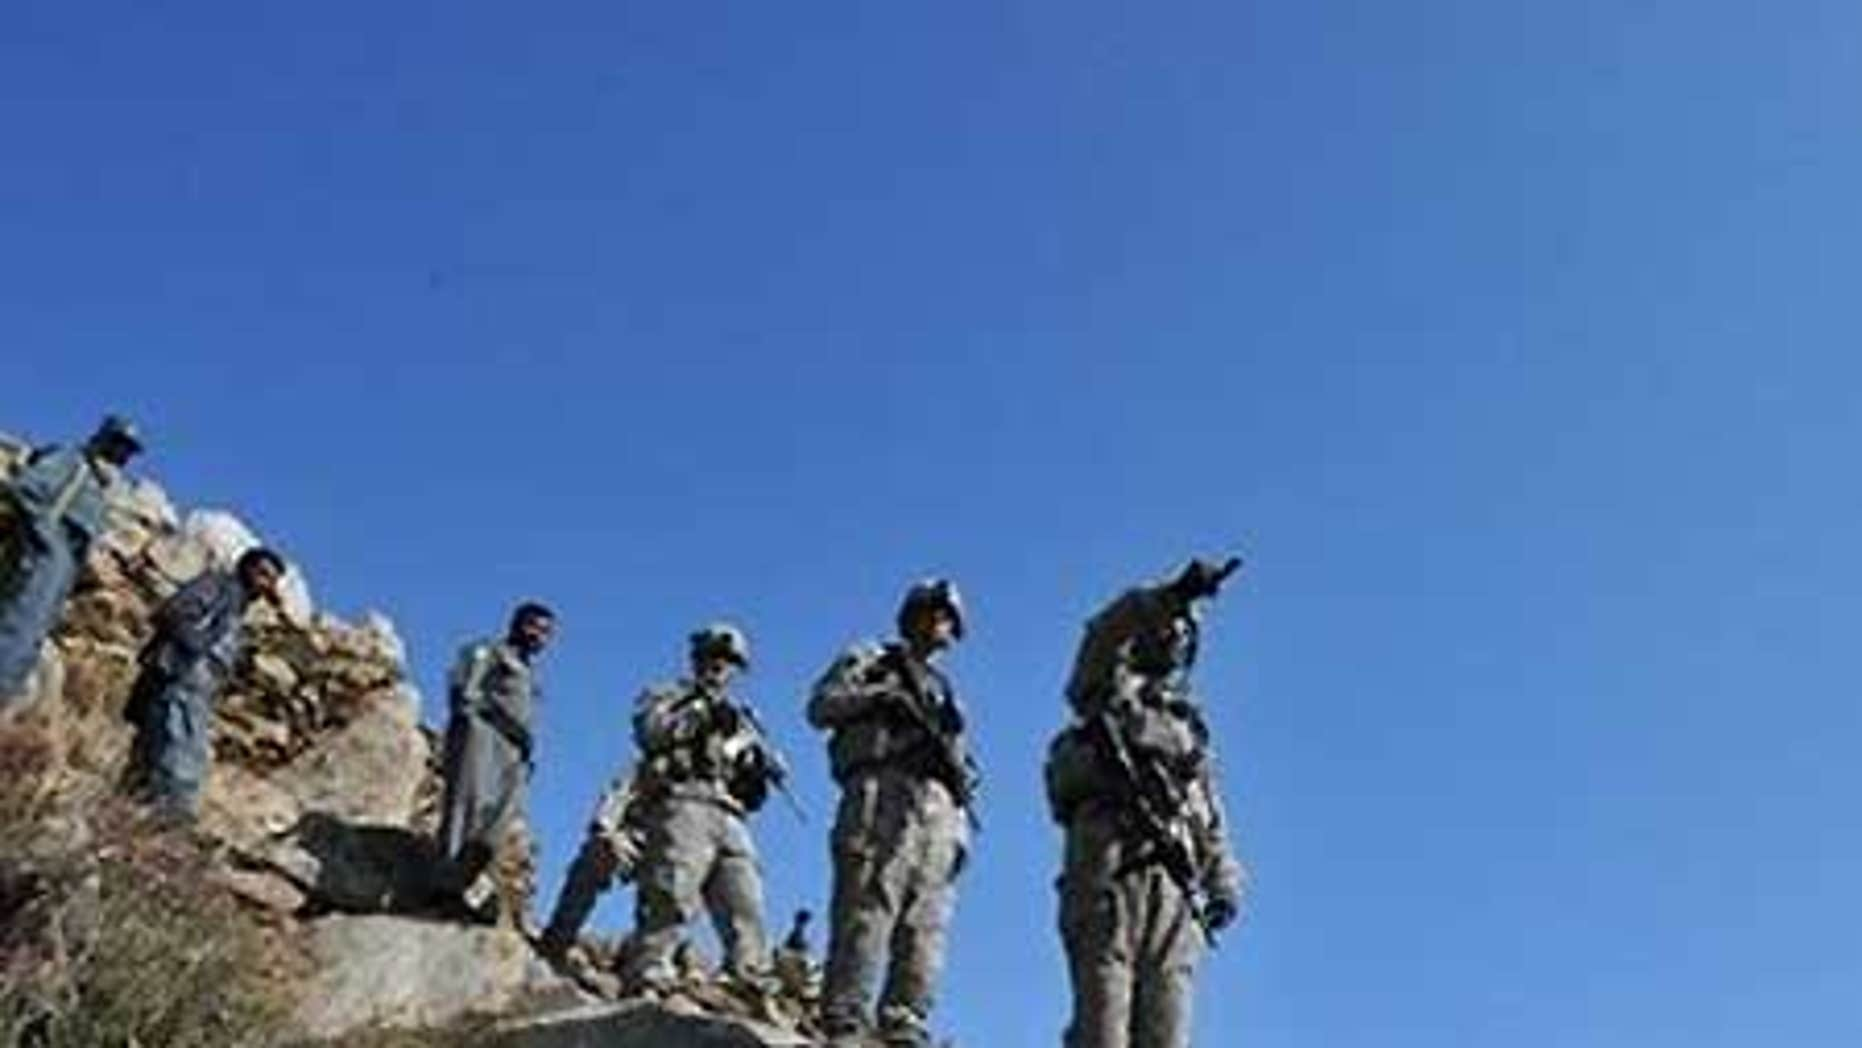 Feb. 17: U.S. troops patrol at Tag in Laghman. Pakistan has confirmed the capture of the Taliban's top military commander Mullah Abdul Ghani Baradar.